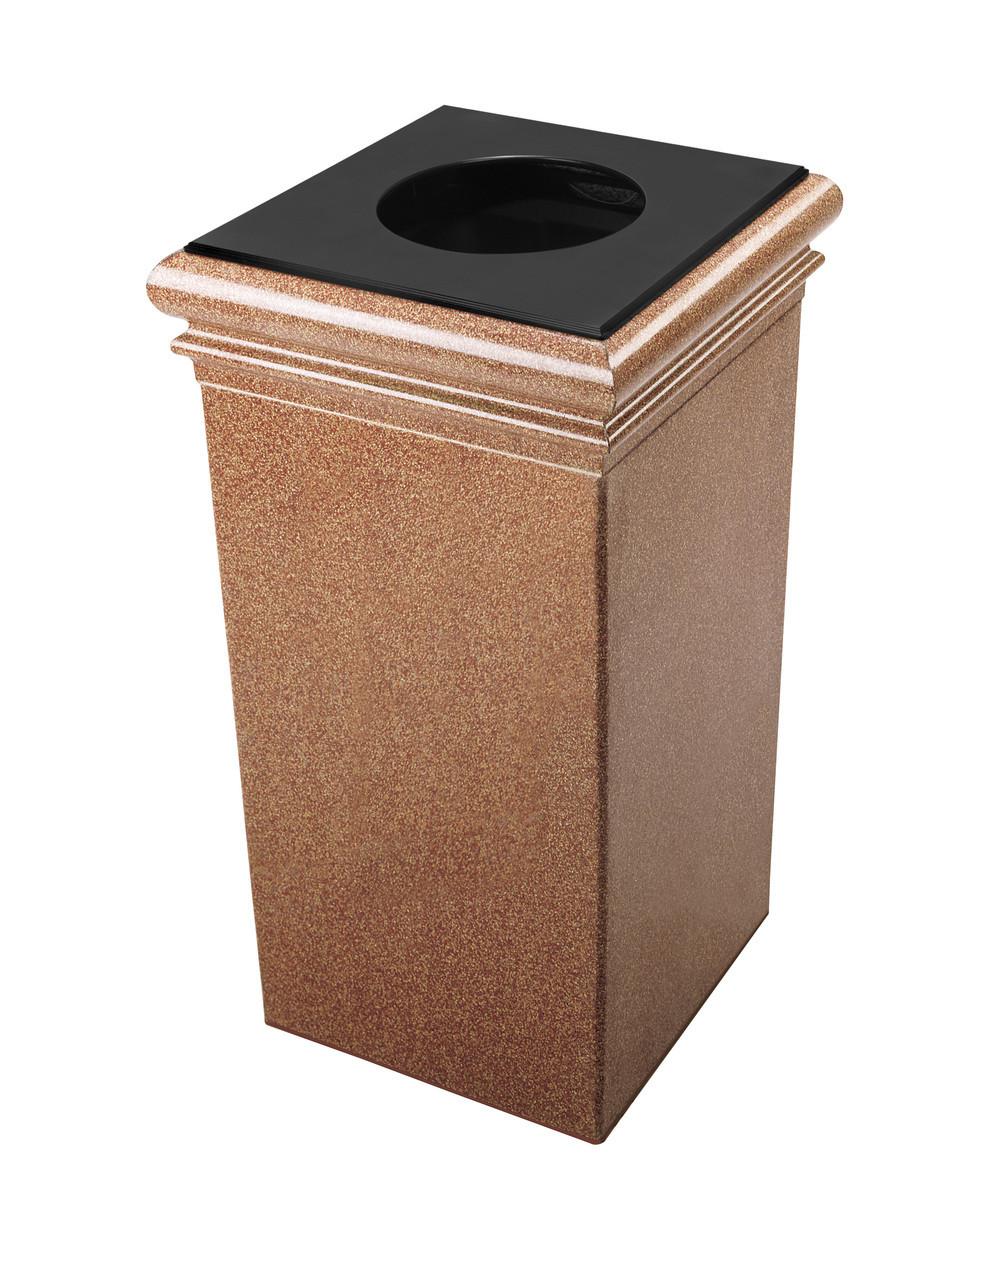 30 Gallon StoneTec Concrete Fiberglass Decorative Trash Can Sedona